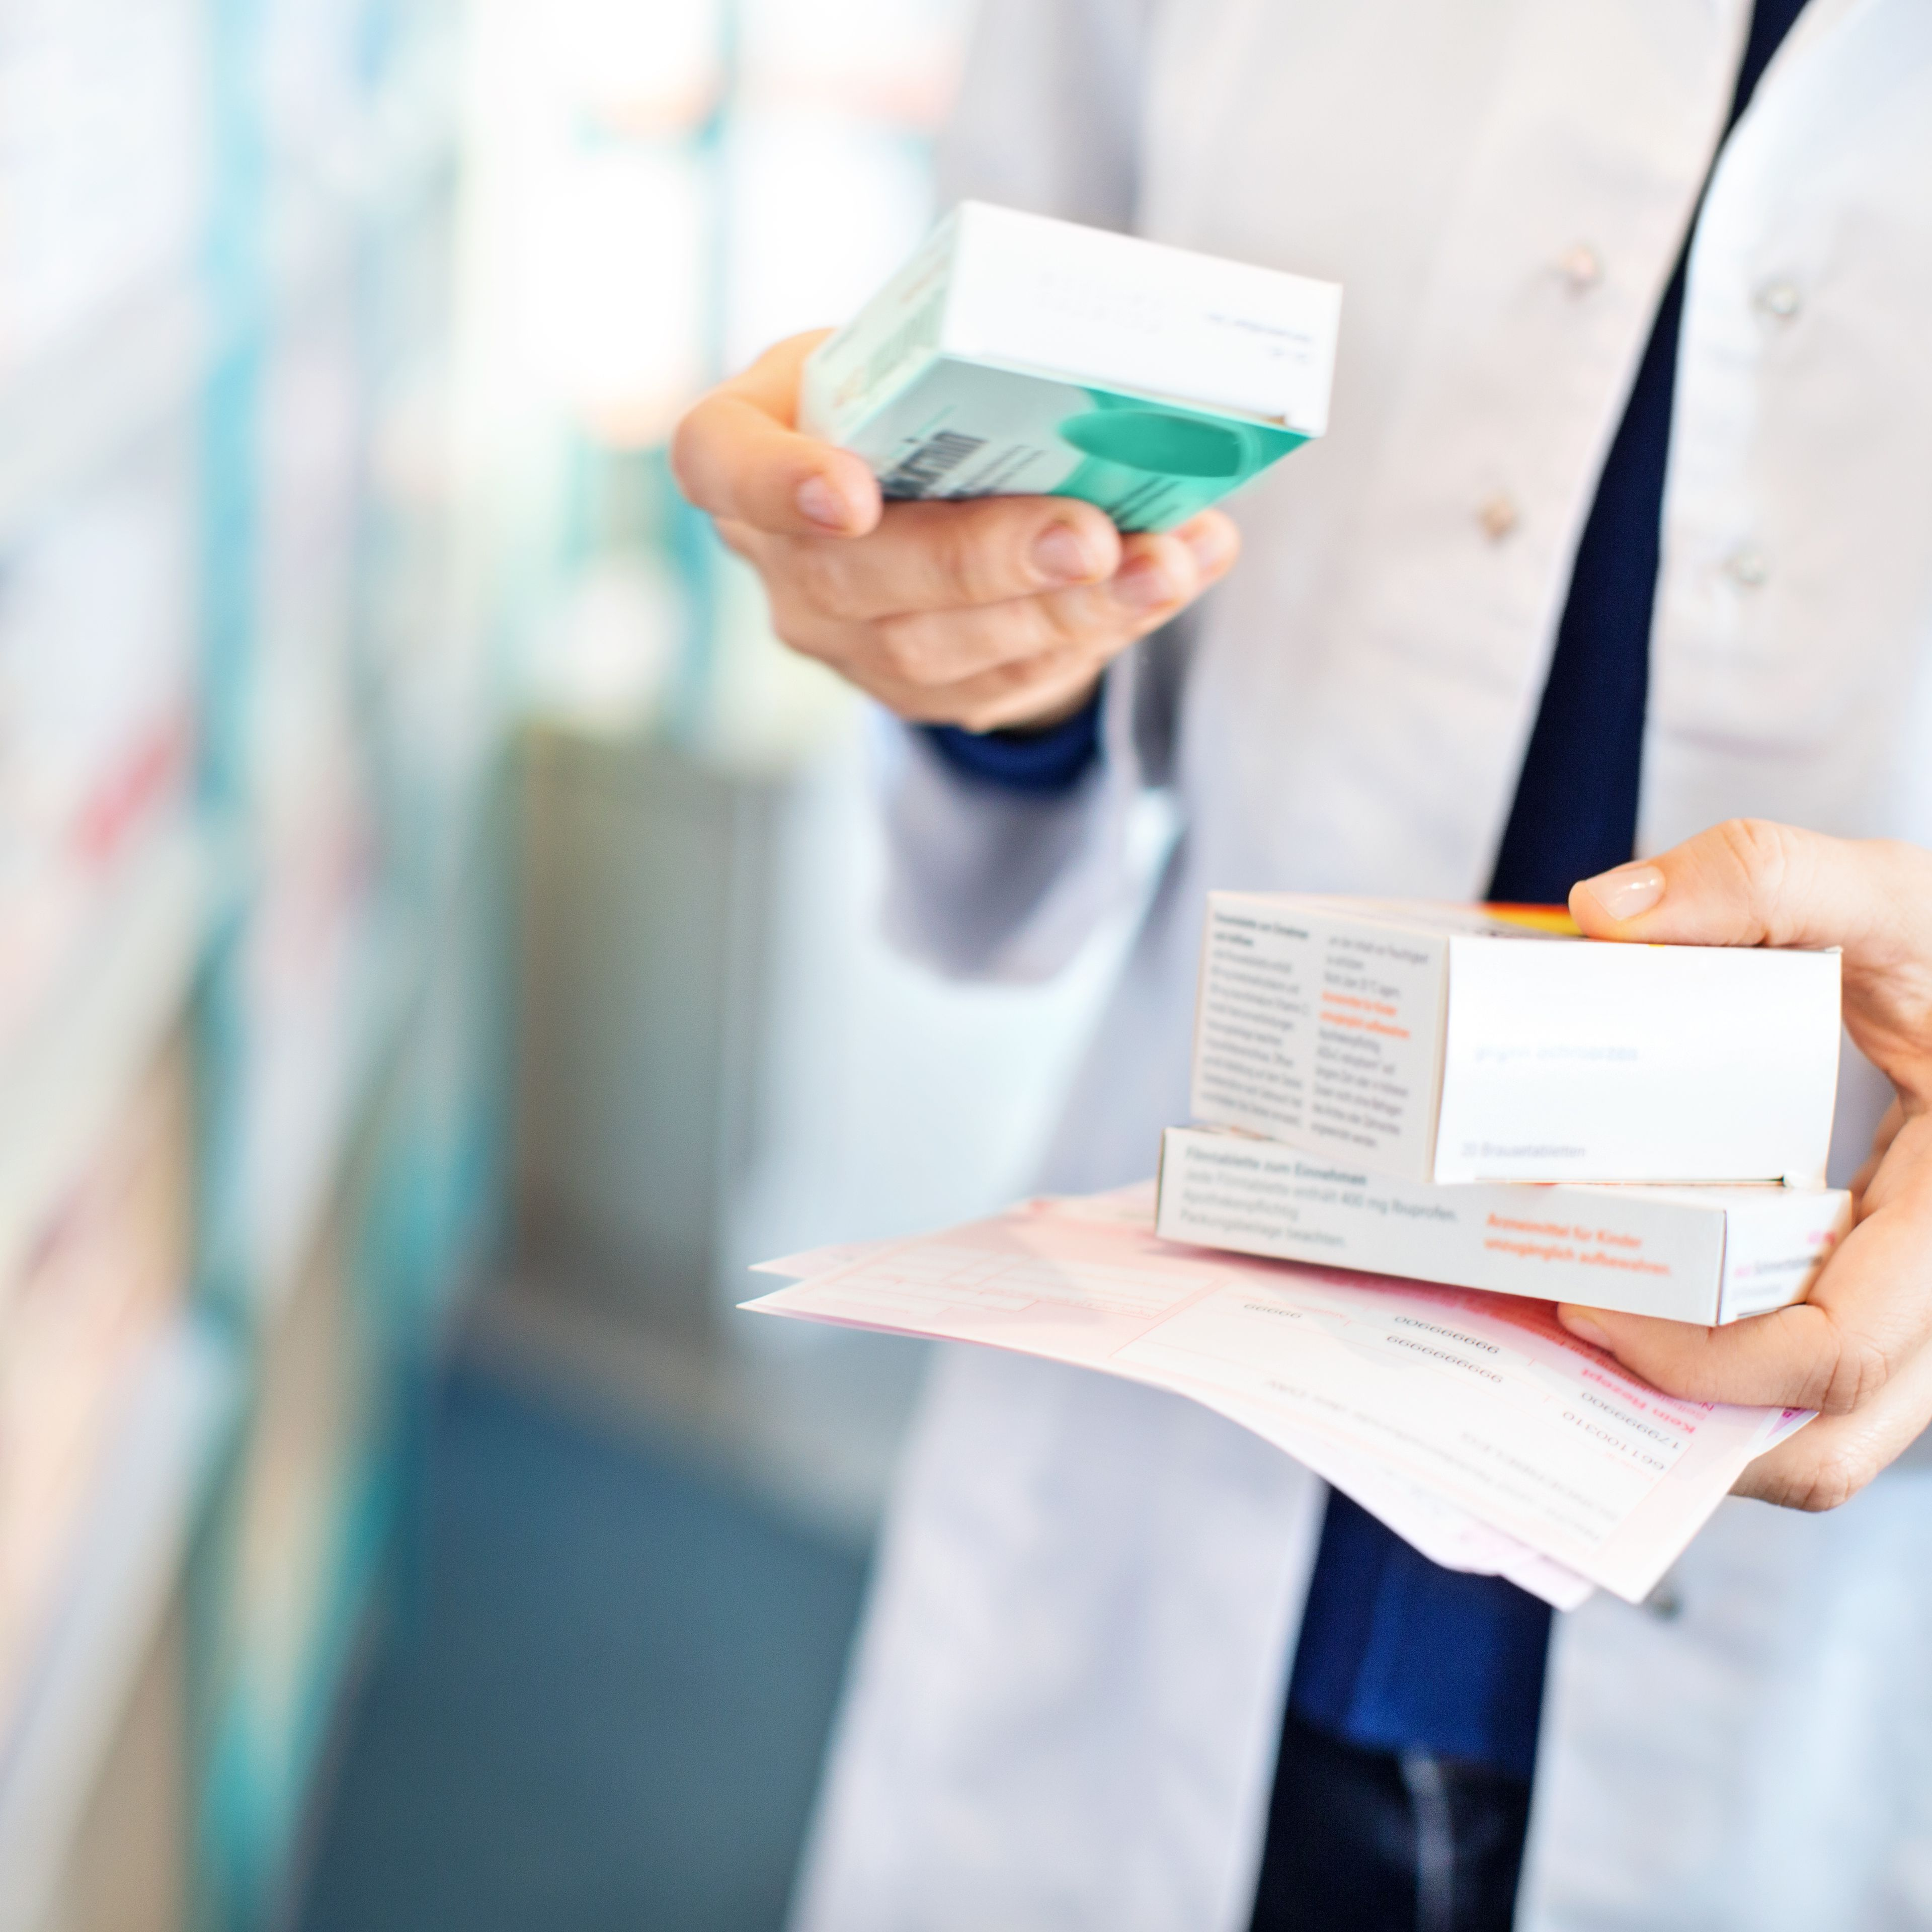 Taking Klonopin (Clonazepam) for Panic Disorder